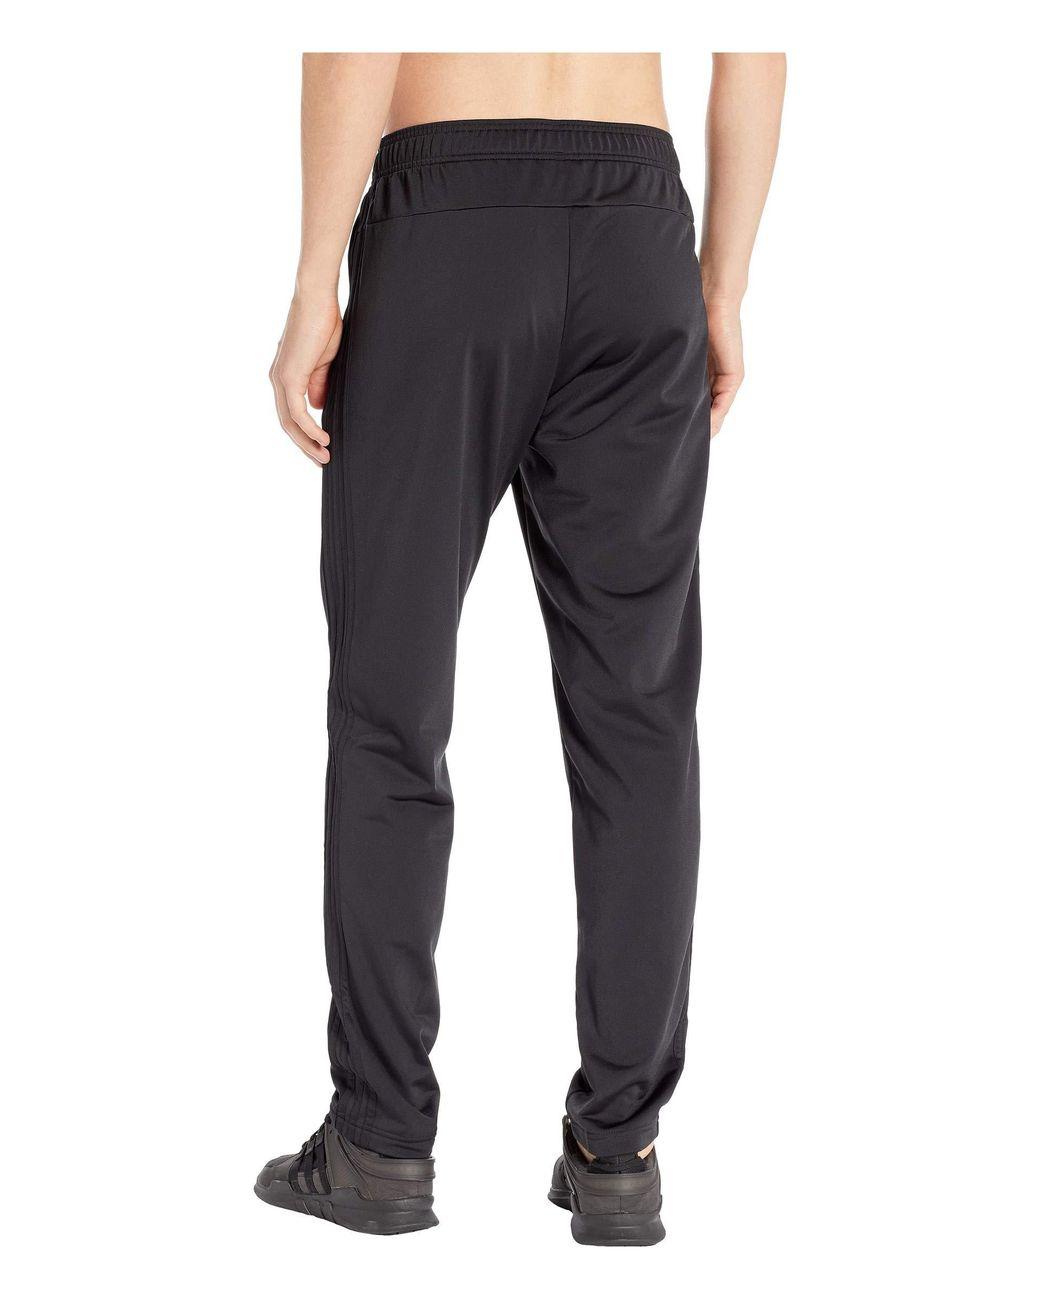 adidas Men's Essentials 3 Stripes Pants (blackscarlet) 2